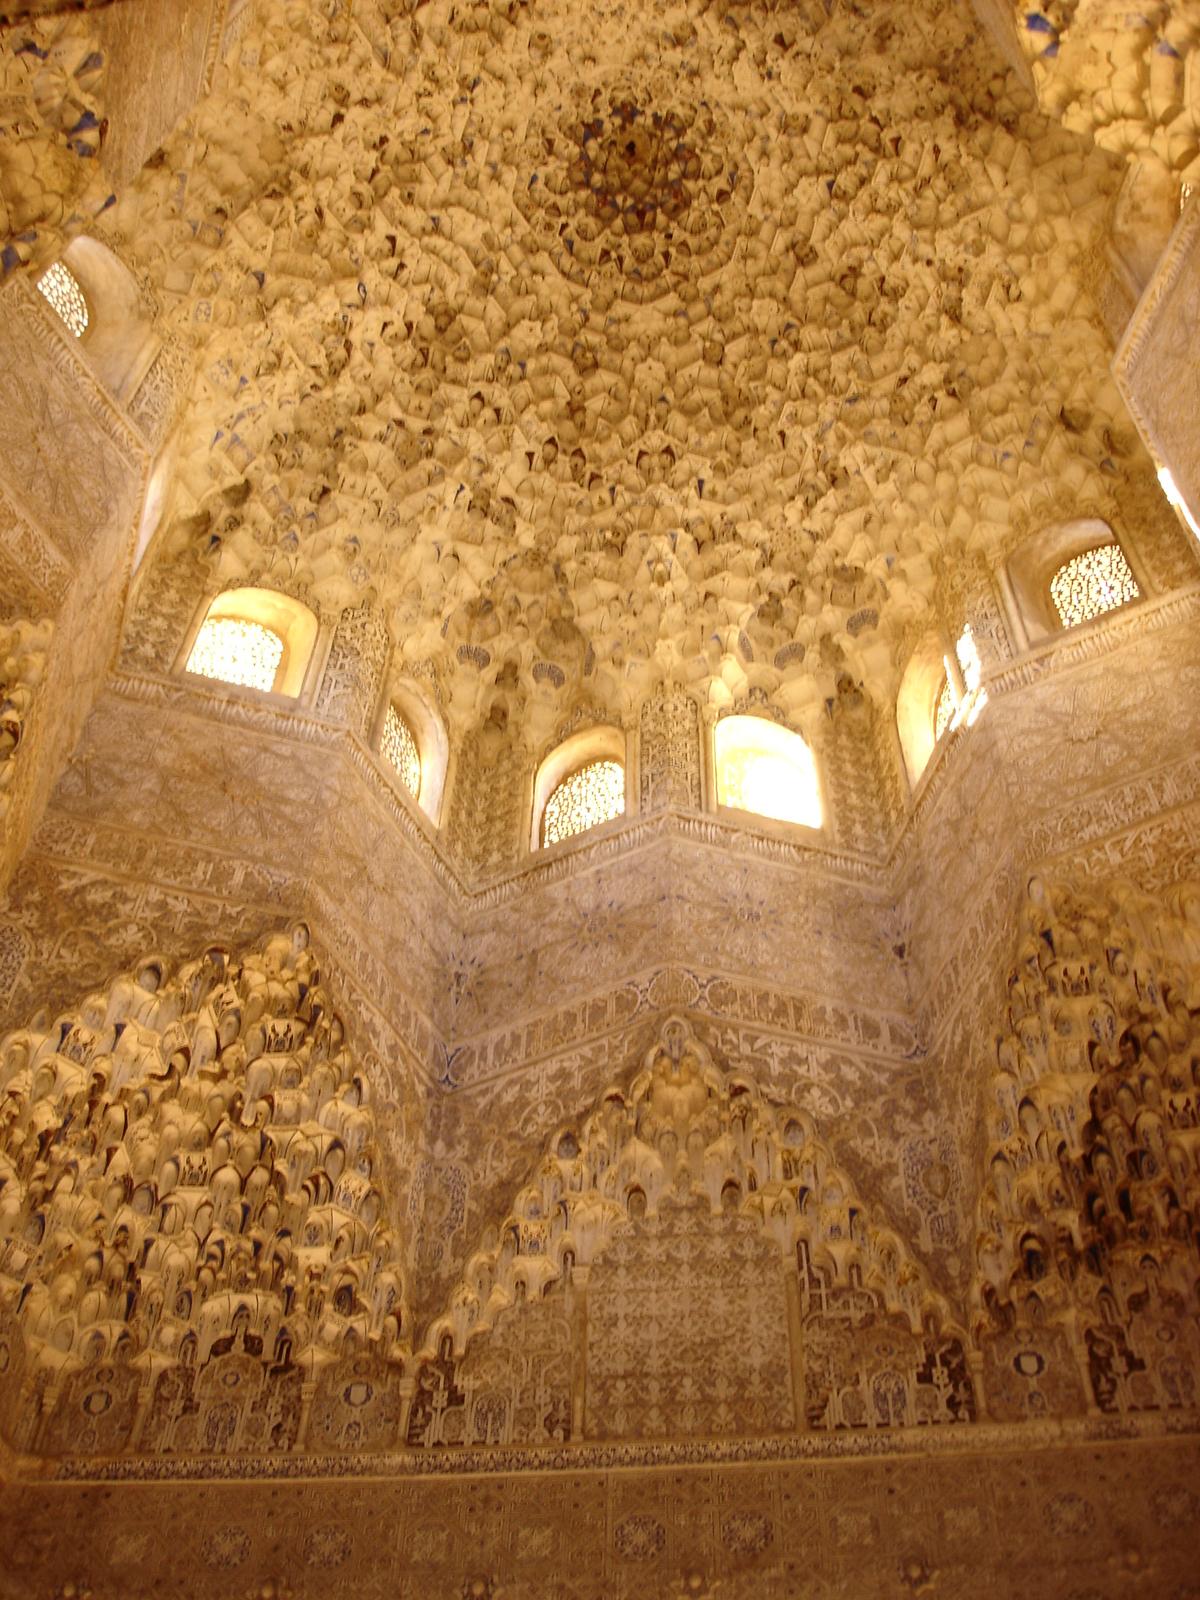 http://www.kelanaconvoy.co.uk/Alhambra_Grenade_mlkfj.jpg